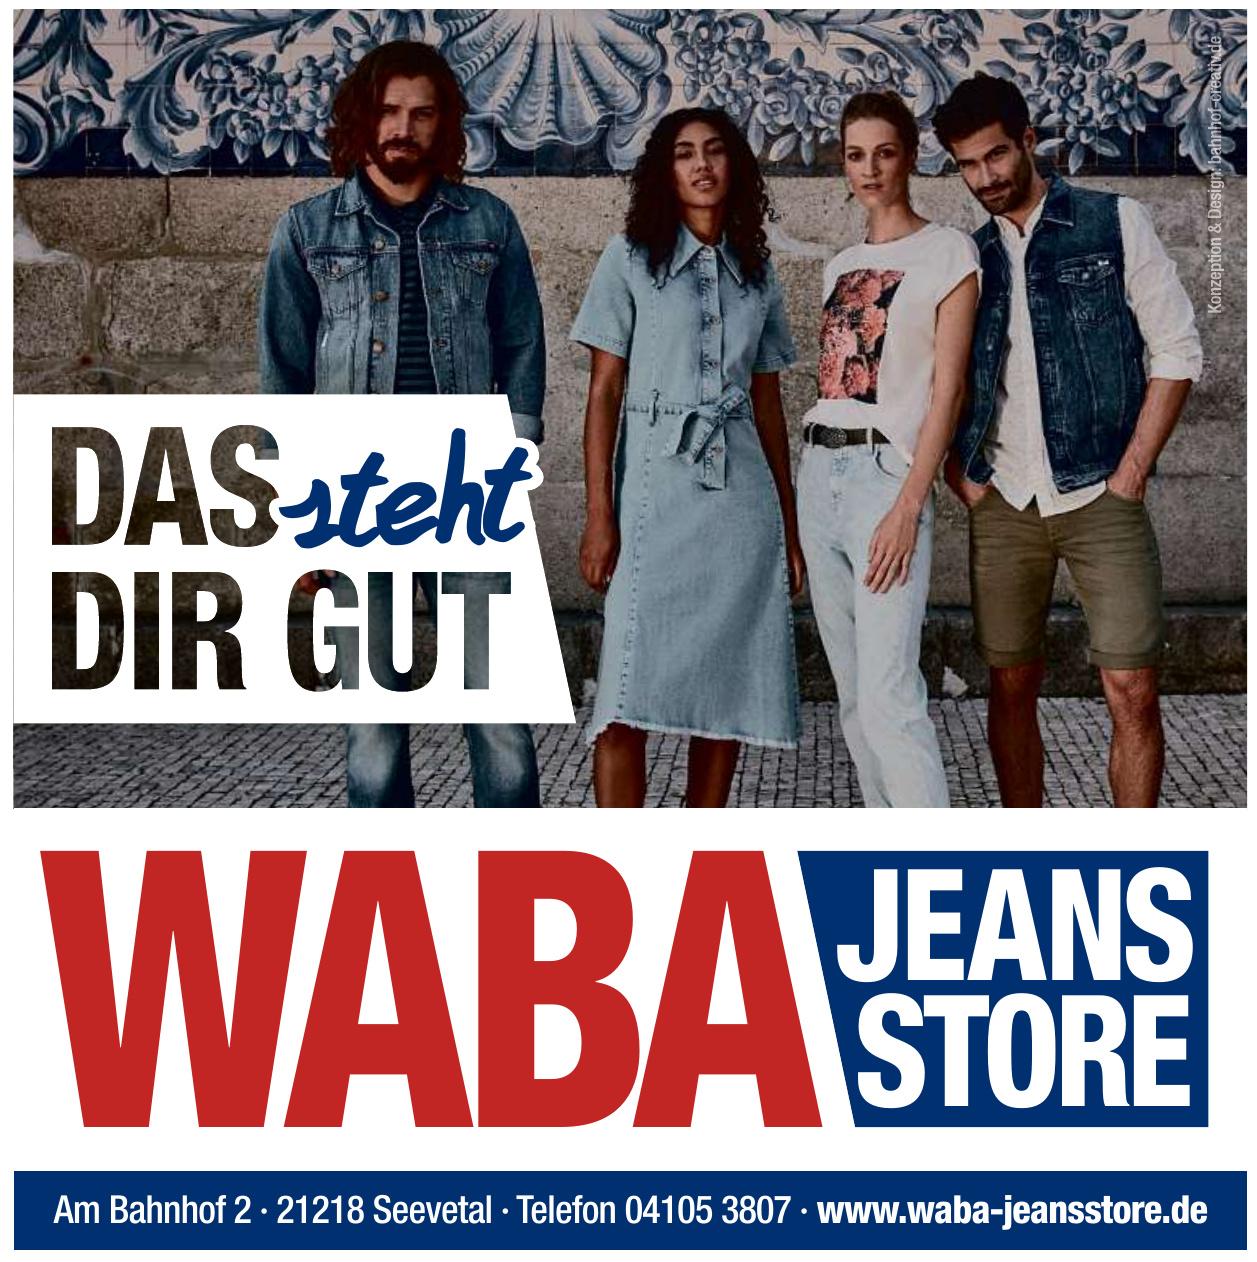 Waba - Jeans Store